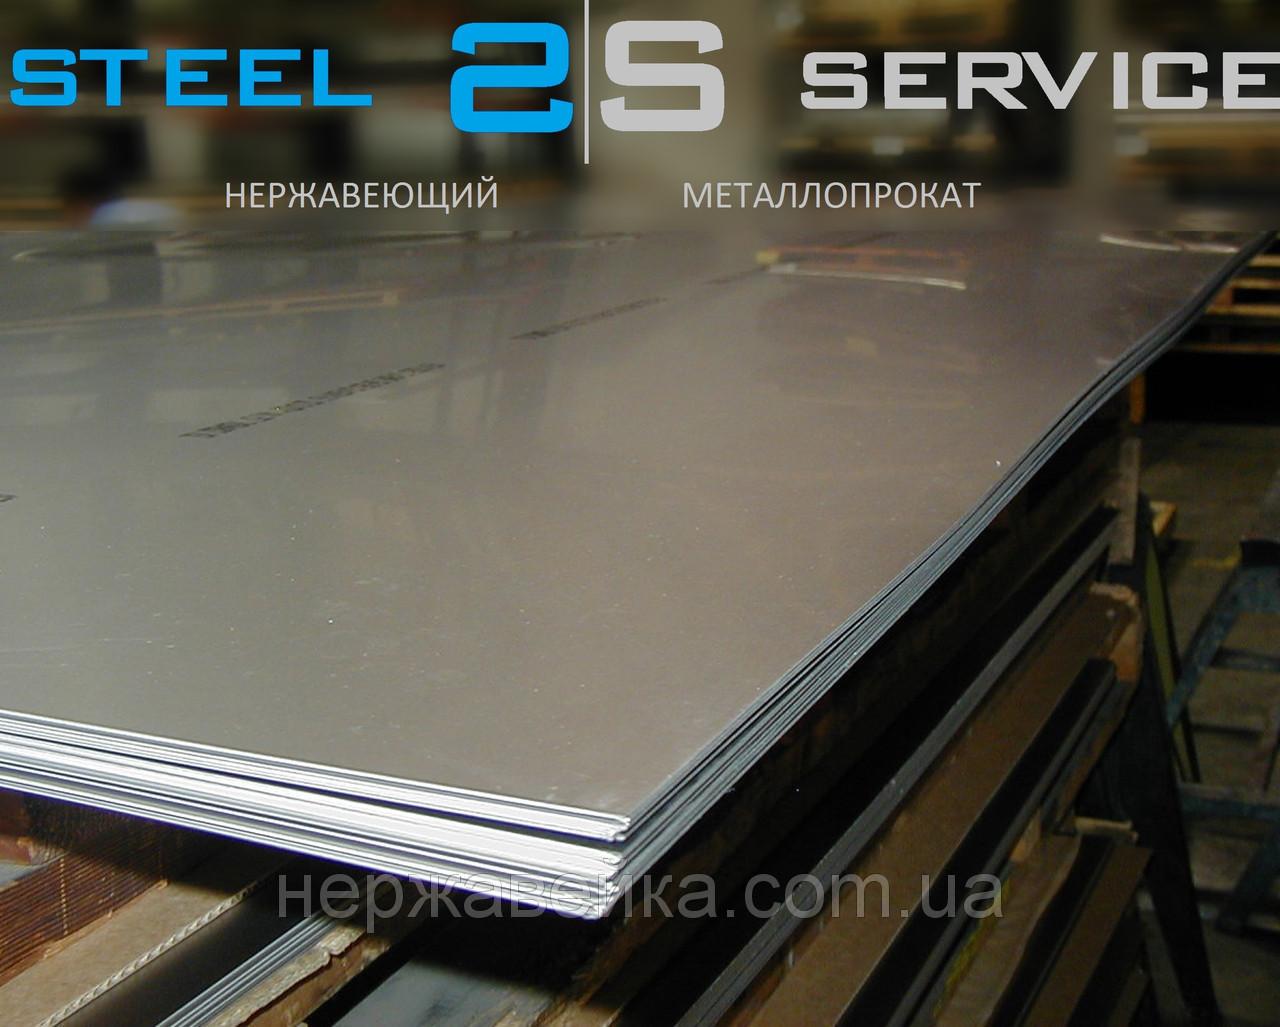 Листовая нержавейка 0,8х1250х2500мм  AISI 316Ti(10Х17Н13М2Т) 2B - матовый,  кислотостойкий